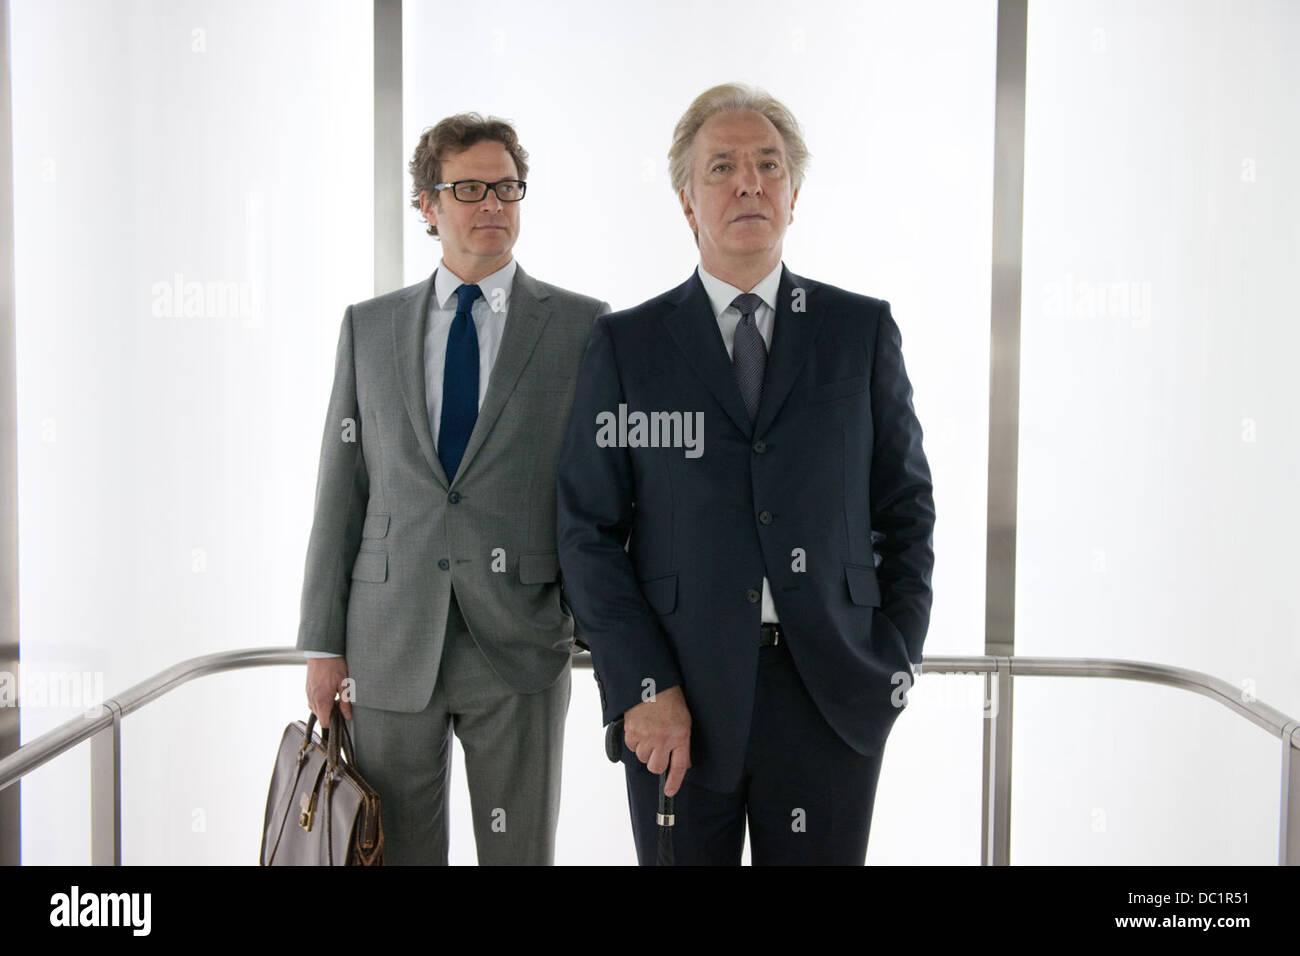 GAMBIT (2012) COLIN FIRTH, ALAN RICKMAN MICHAEL HOFFMAN (DIR) 005 MOVIESTORE COLLECTION LTD - Stock Image